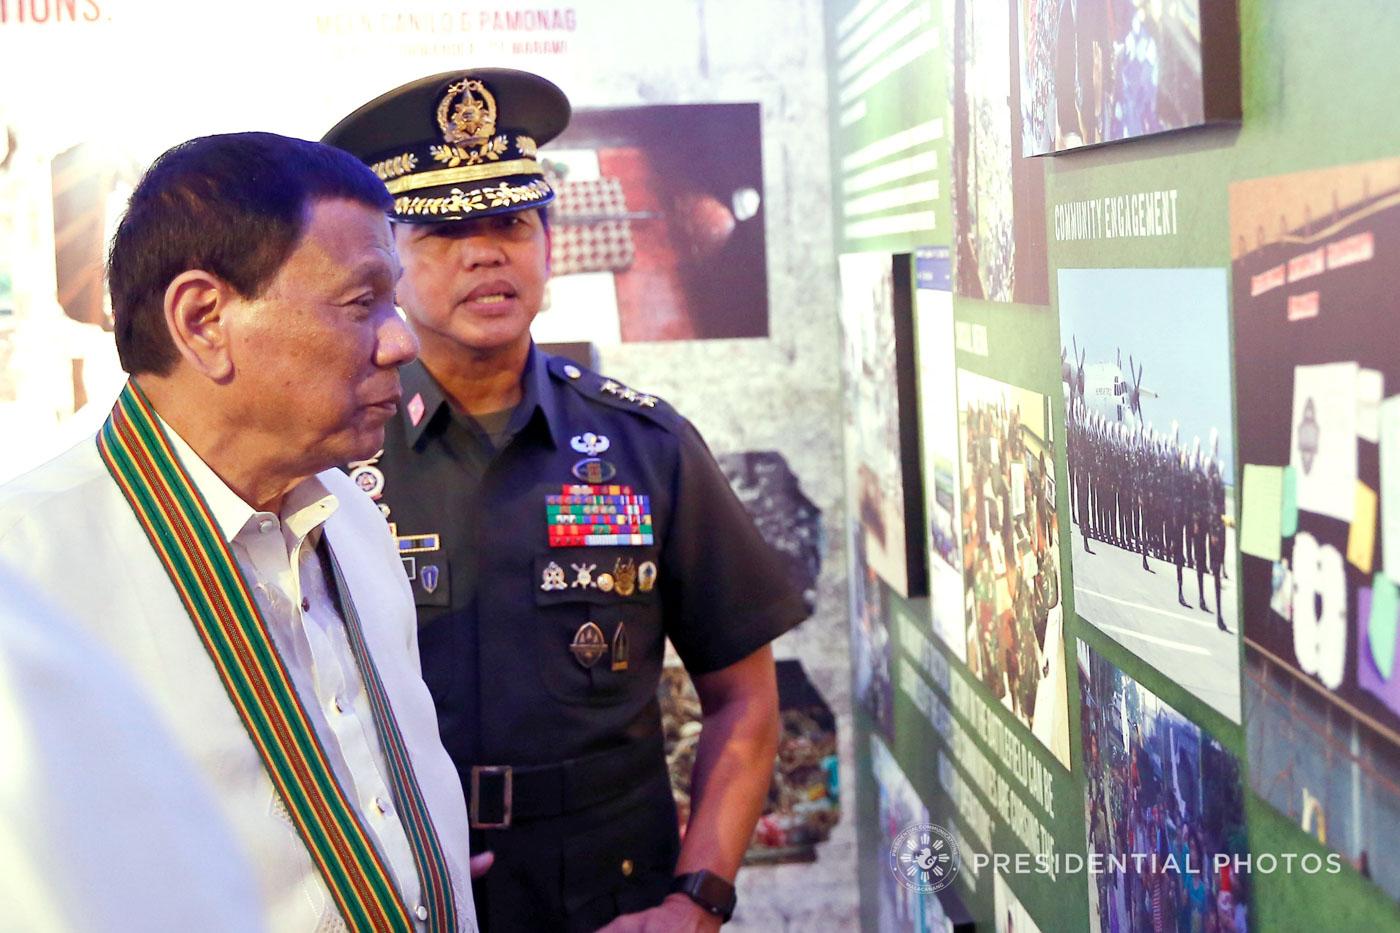 PHILIPPINE ARMY. Army chief Lieutenant General Rolando Joselito Bautista tours President Rodrigo Roa Duterte inside the Army Museum during the 121st anniversary celebration of the service on March 20, 2018. Malacau00f1ang Photo